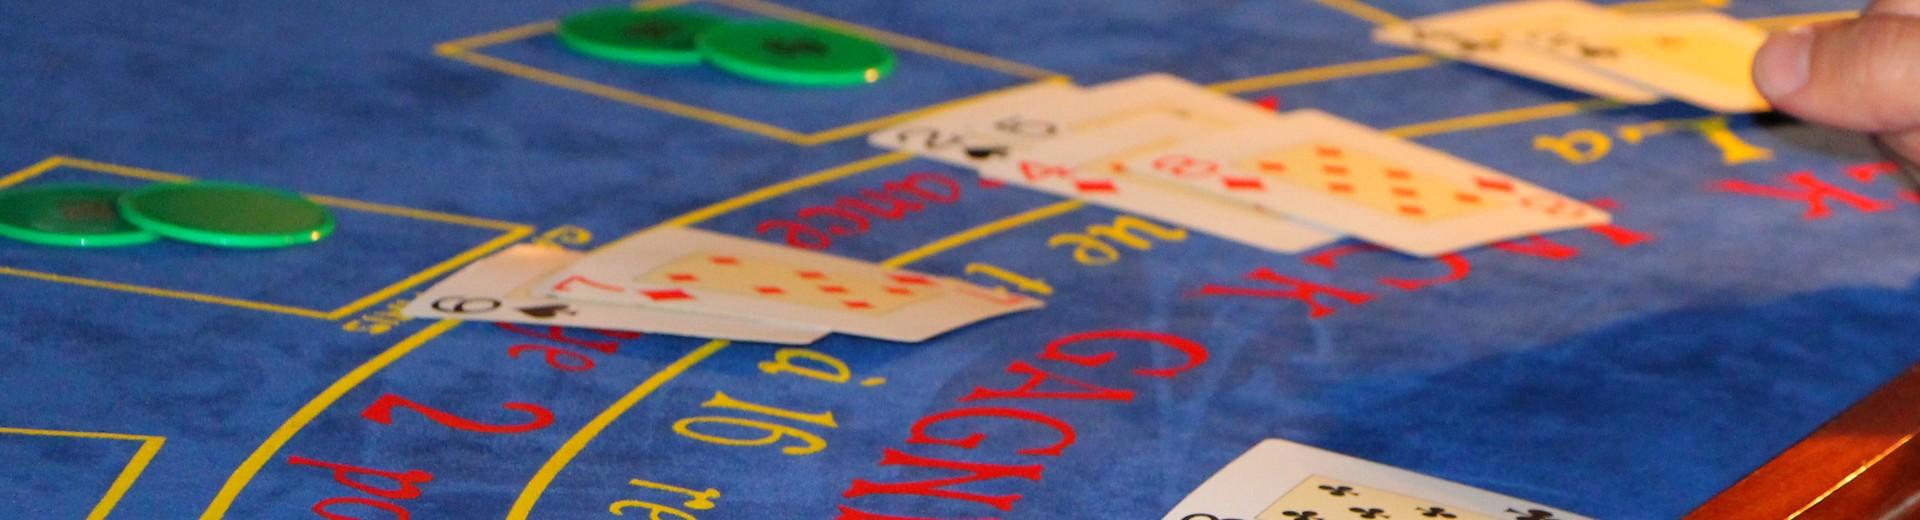 Blackjack en ligne: une renommée mondiale